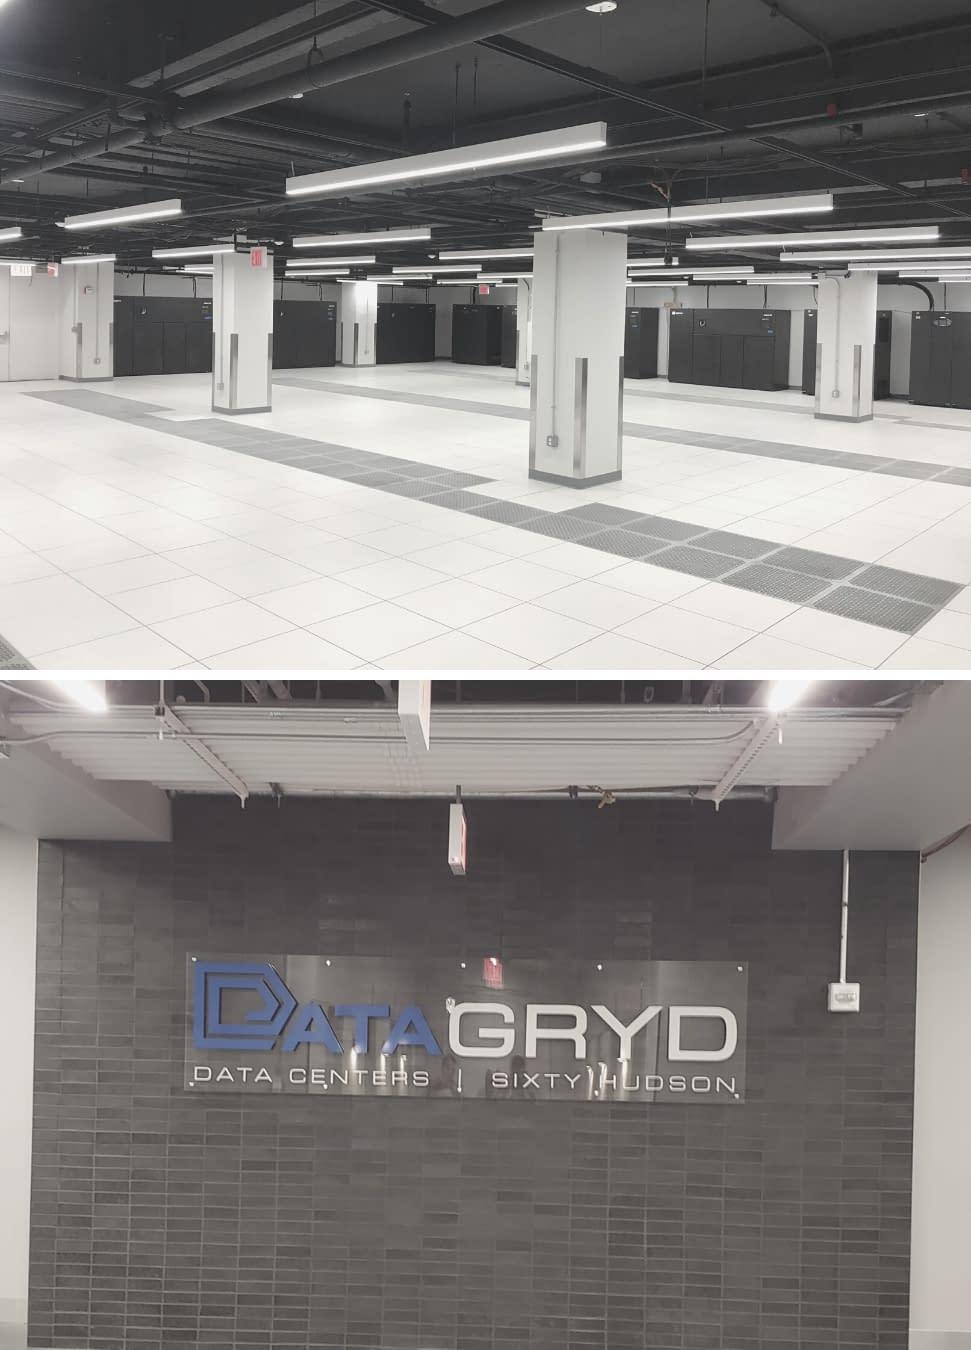 datagryd facility